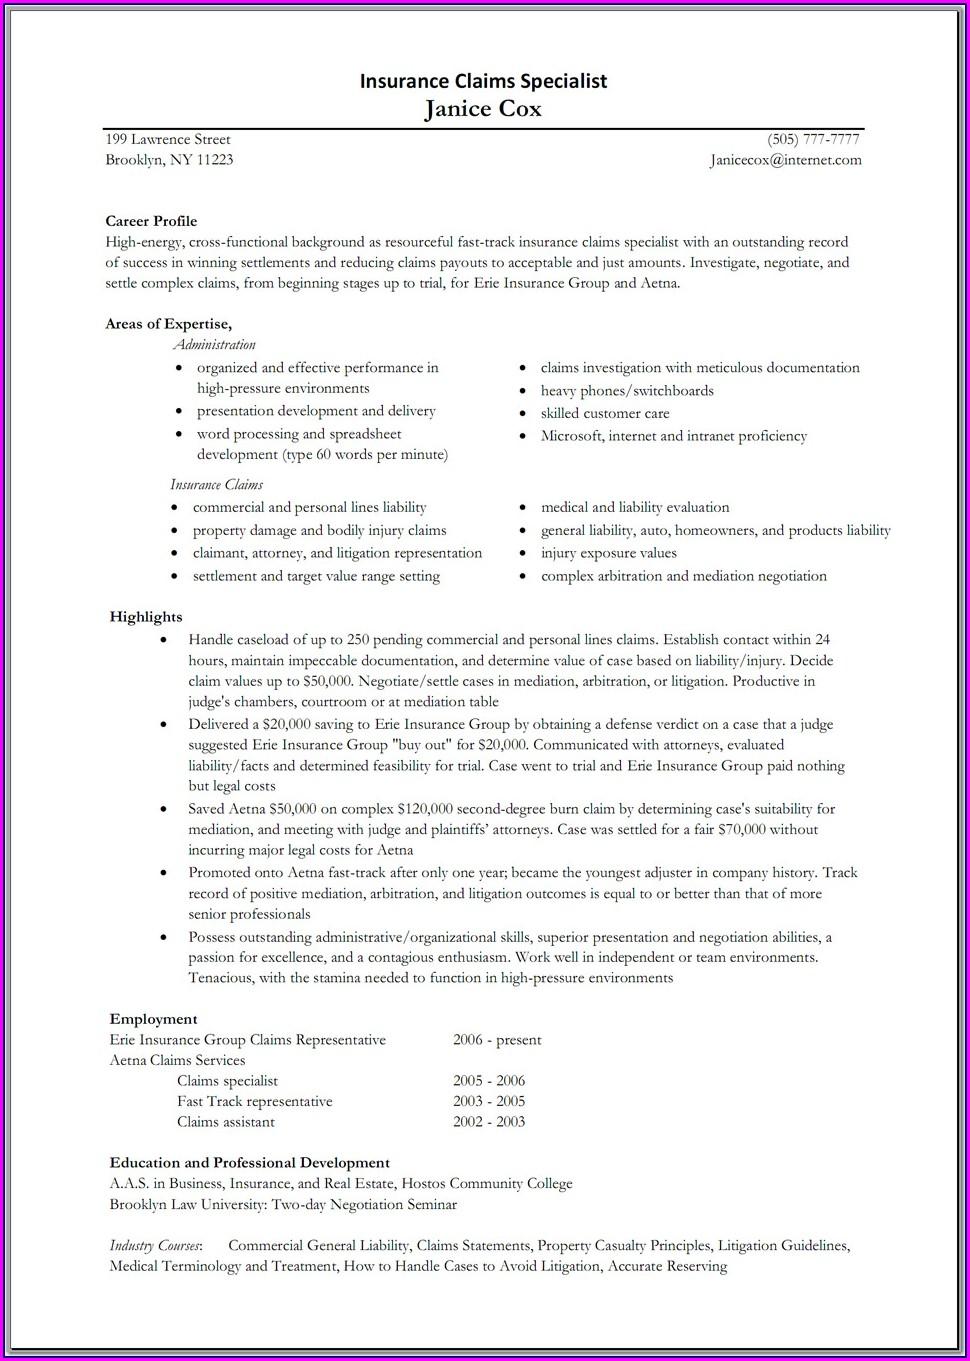 Life Insurance Agent Resume Sample